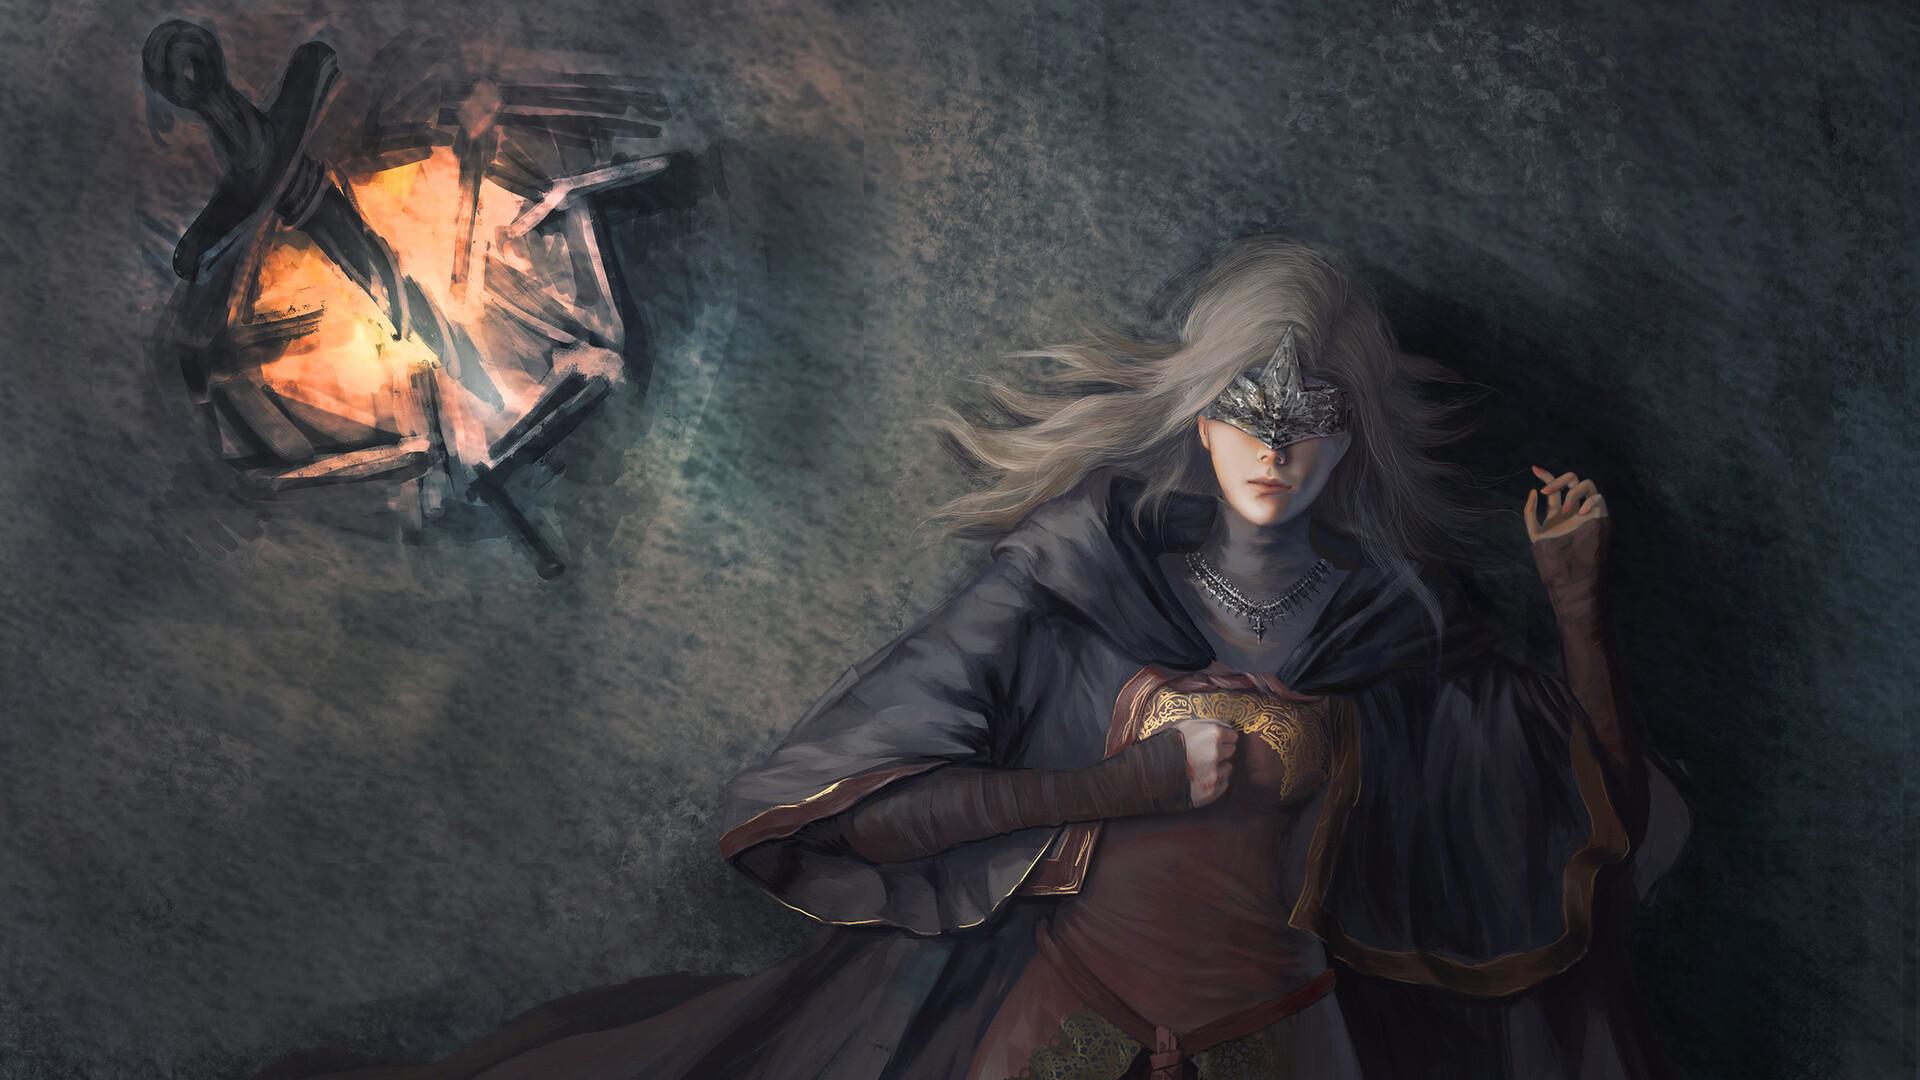 Dark Souls 3 Wallpaper 1080p: 1920x1080 Dark Souls 3 Artwork HD Laptop Full HD 1080P HD